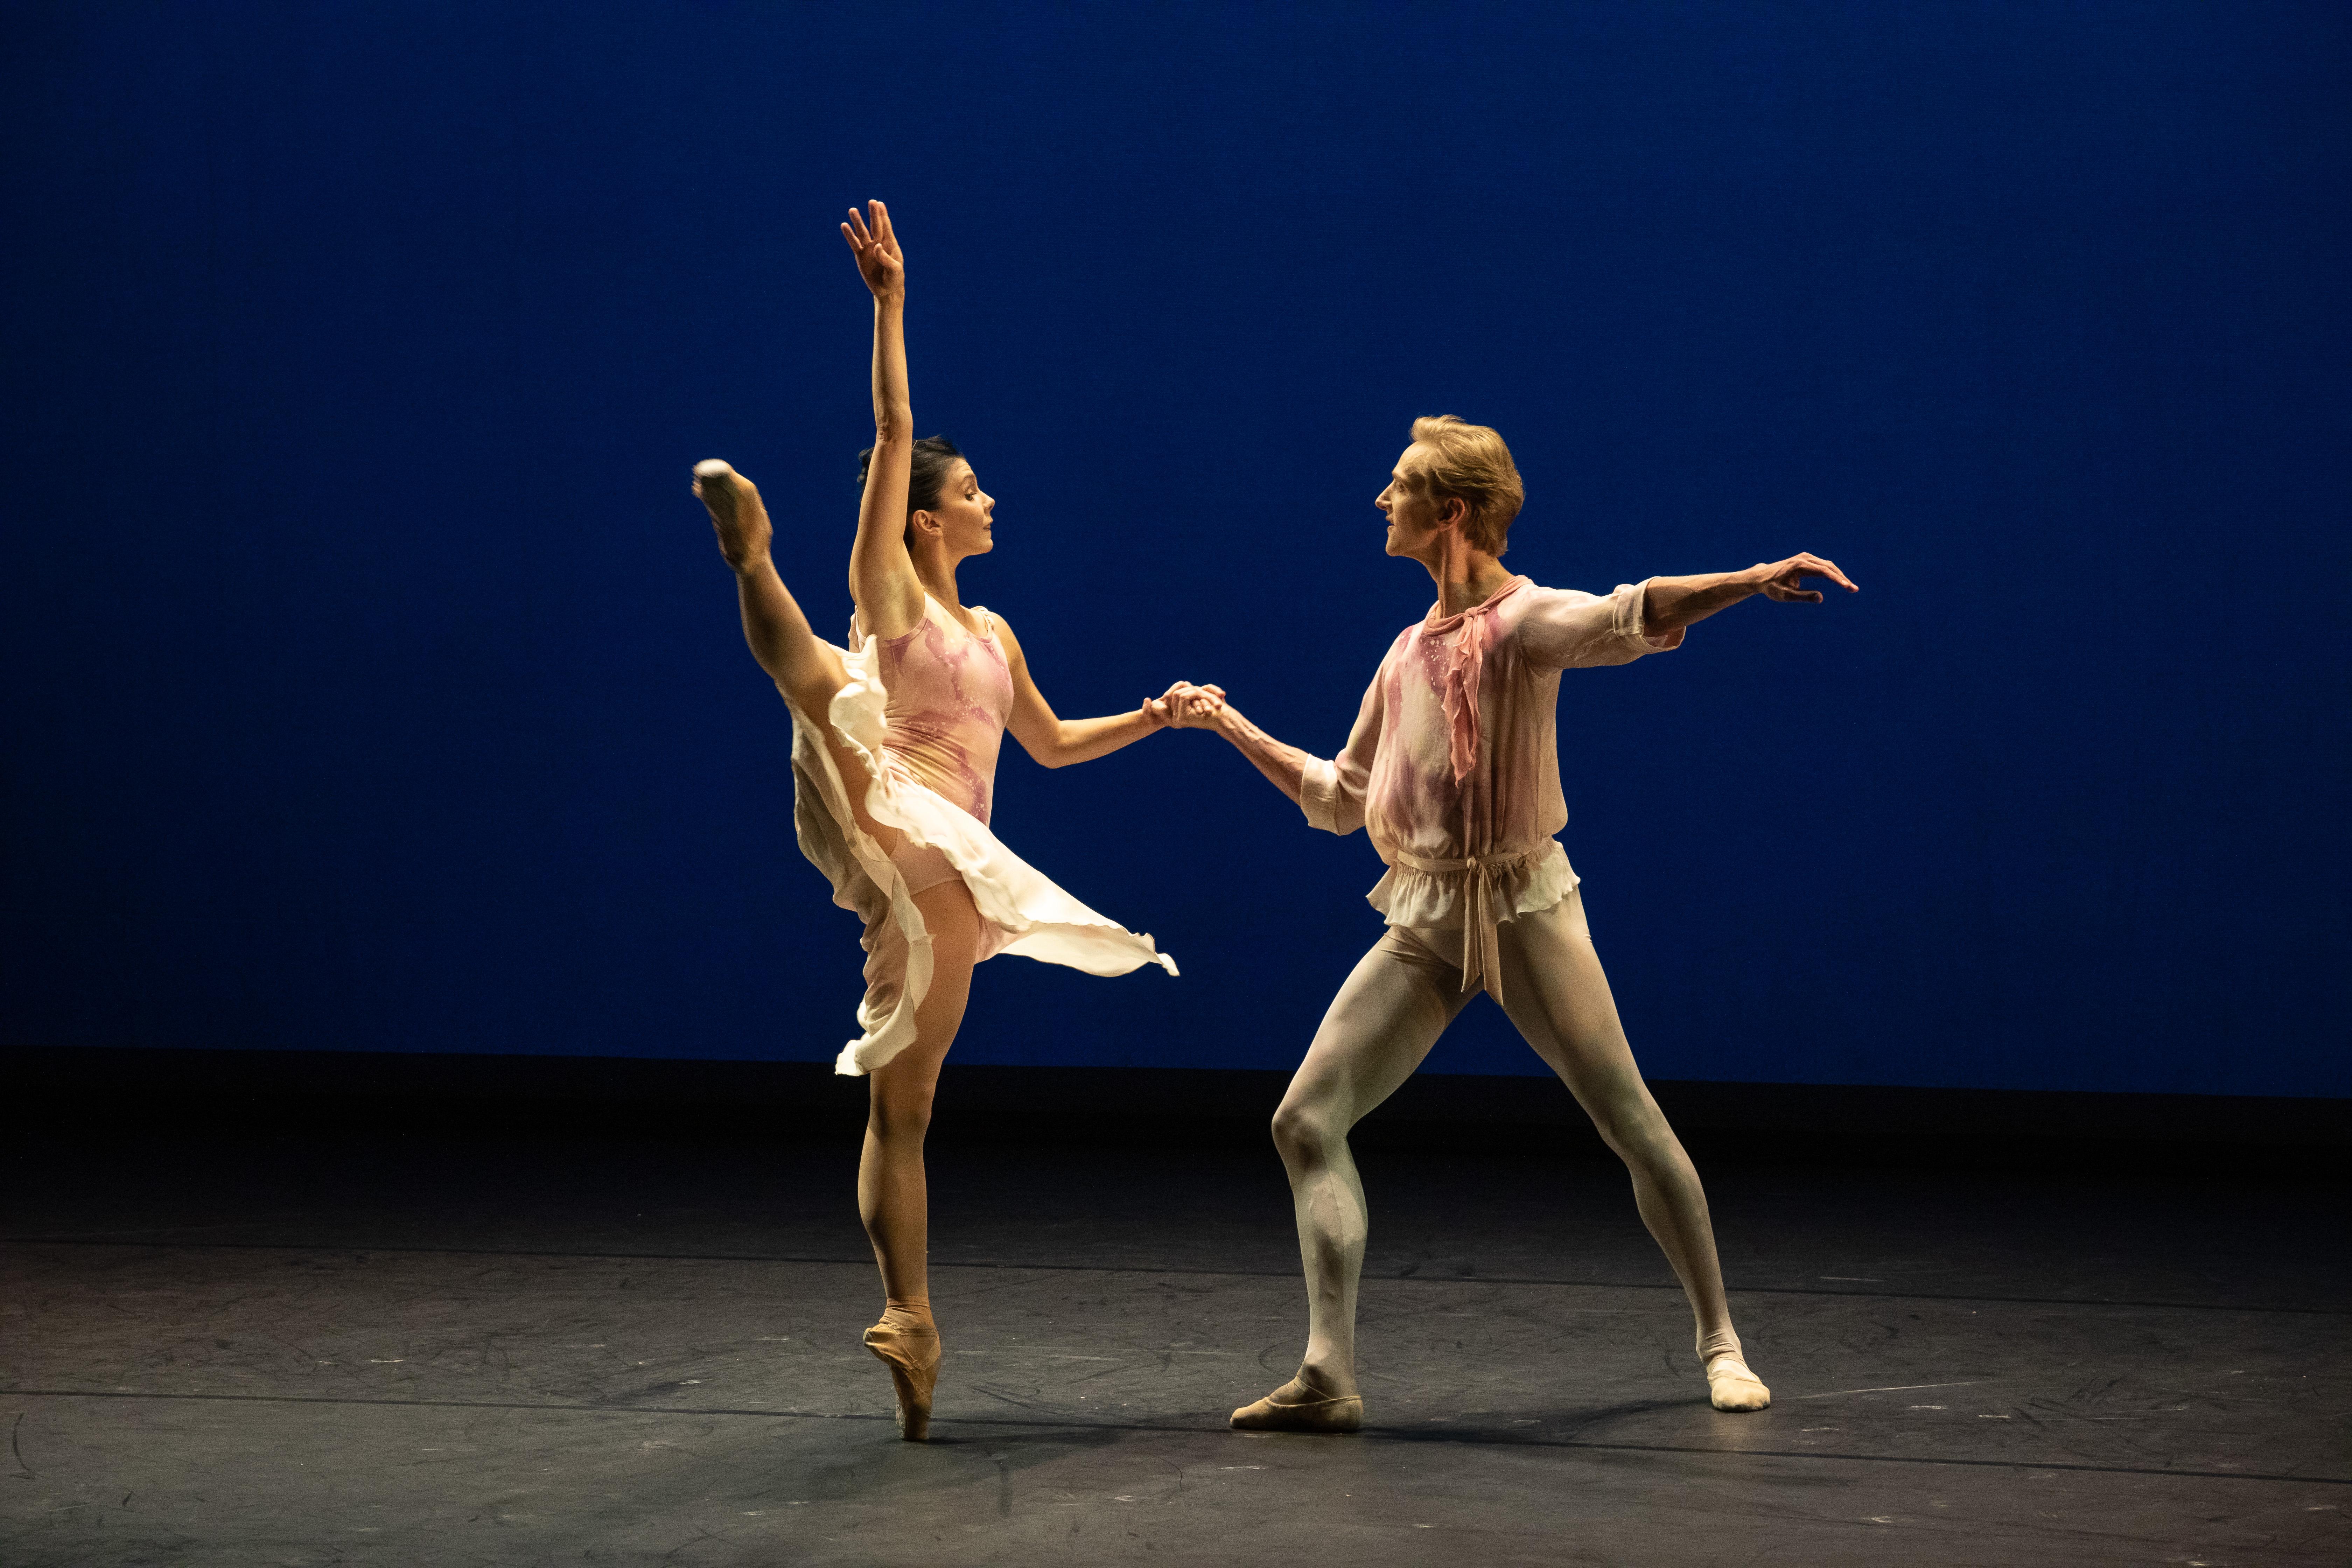 Natalia Osipova's Pure Dance